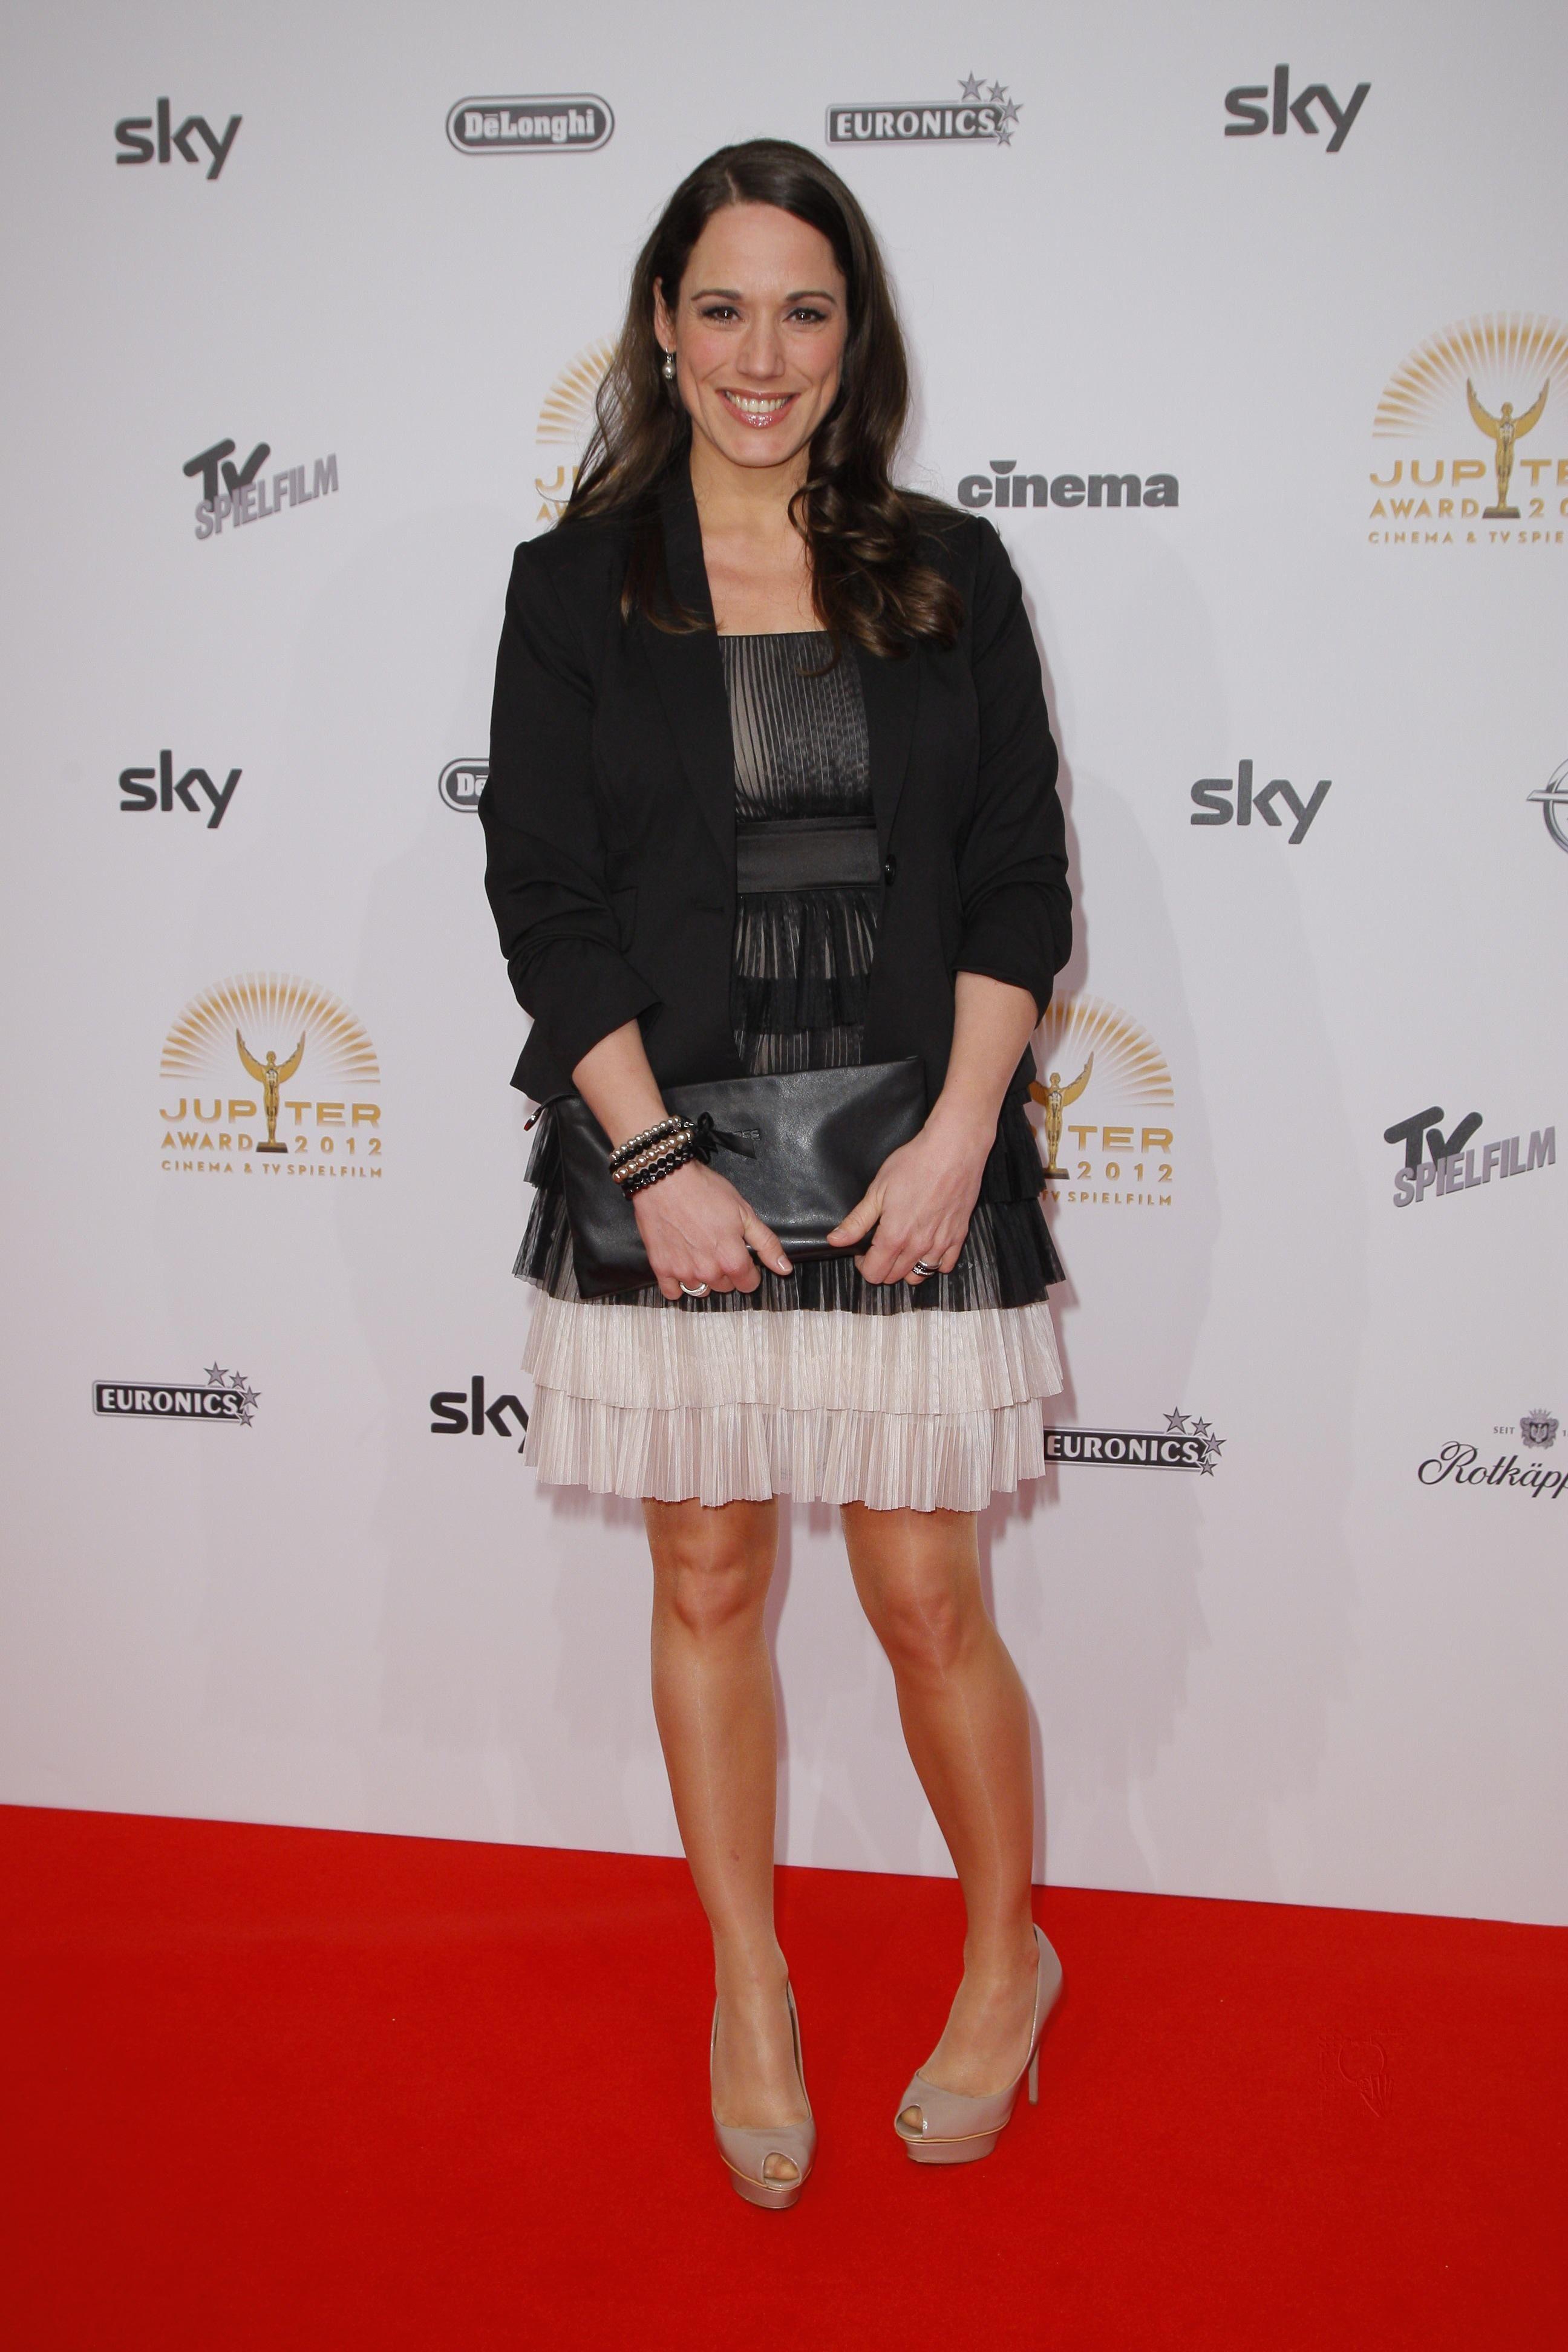 Simone Panteleit (2012-03-29) | S | Celebrities